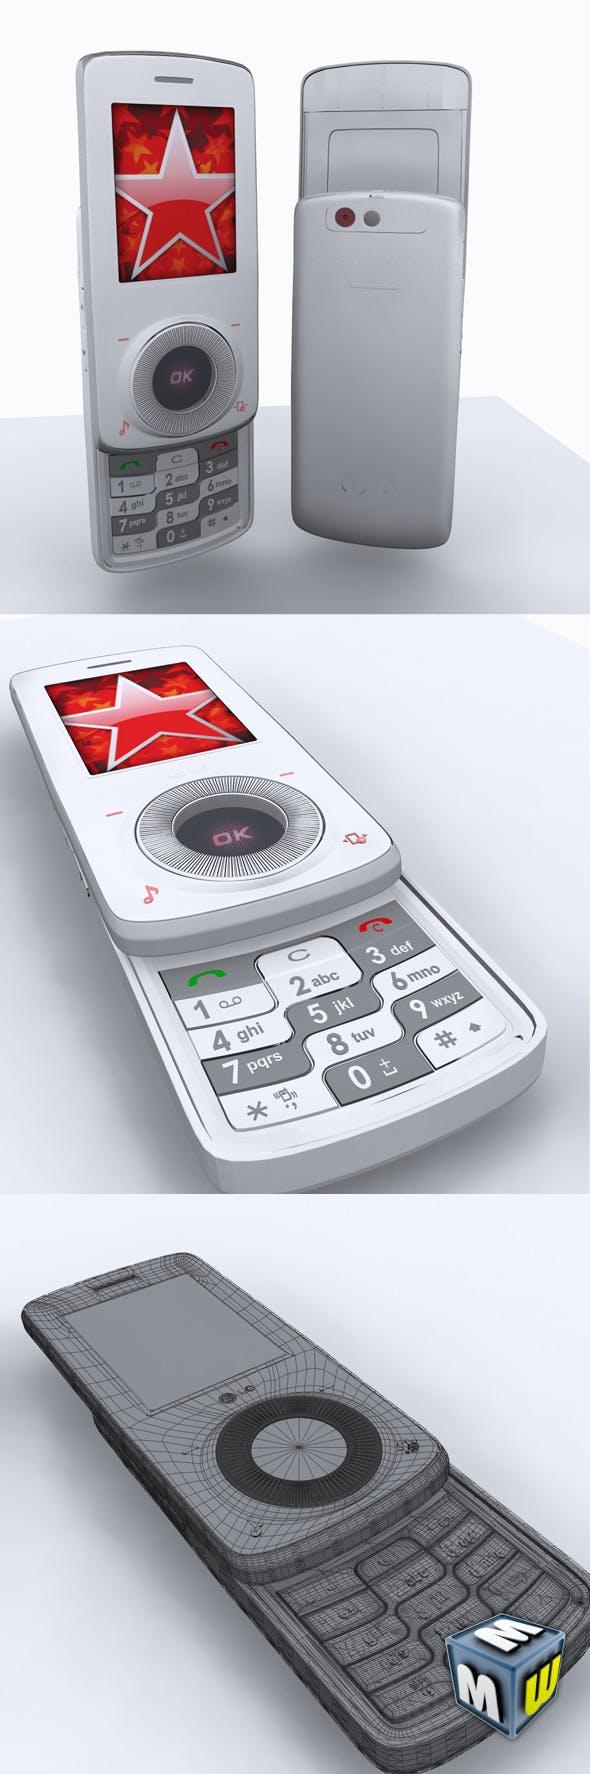 LG KM710 - 3DOcean Item for Sale